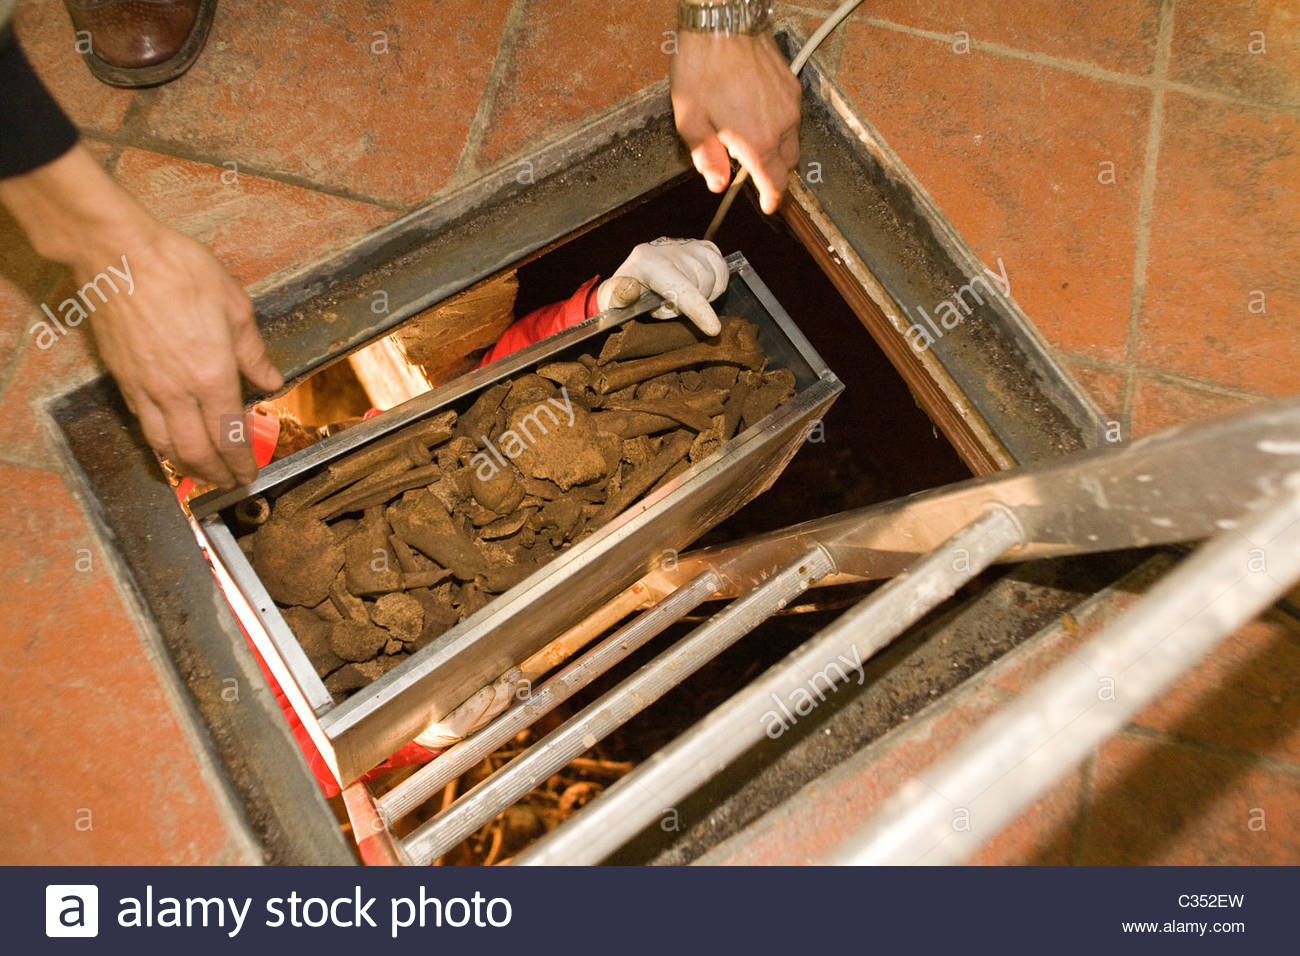 caravaggio committee,bones from the cemetery where caravaggio was buried,porto ercole,tuscany - Stock Image